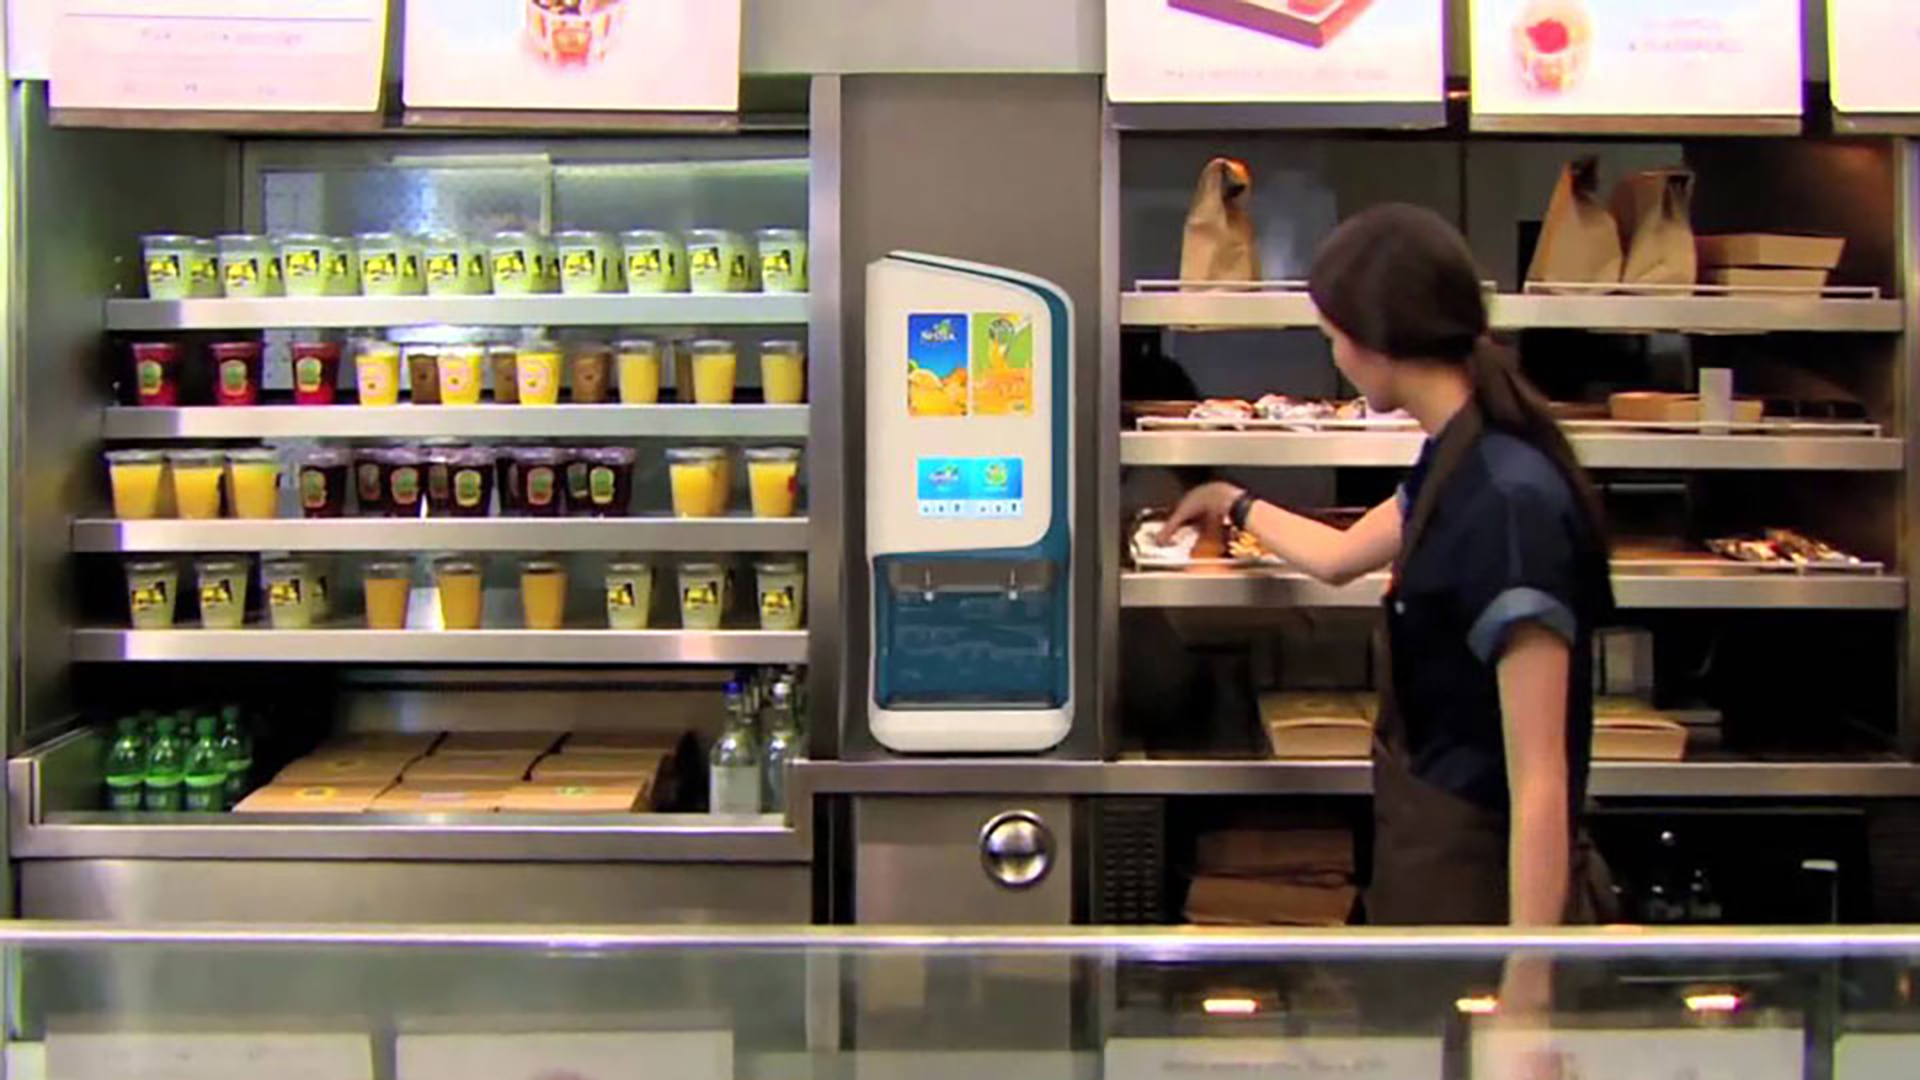 priority_designs_nestle_cold_beverage_dispense_commercial_machine_design_prototyping_005